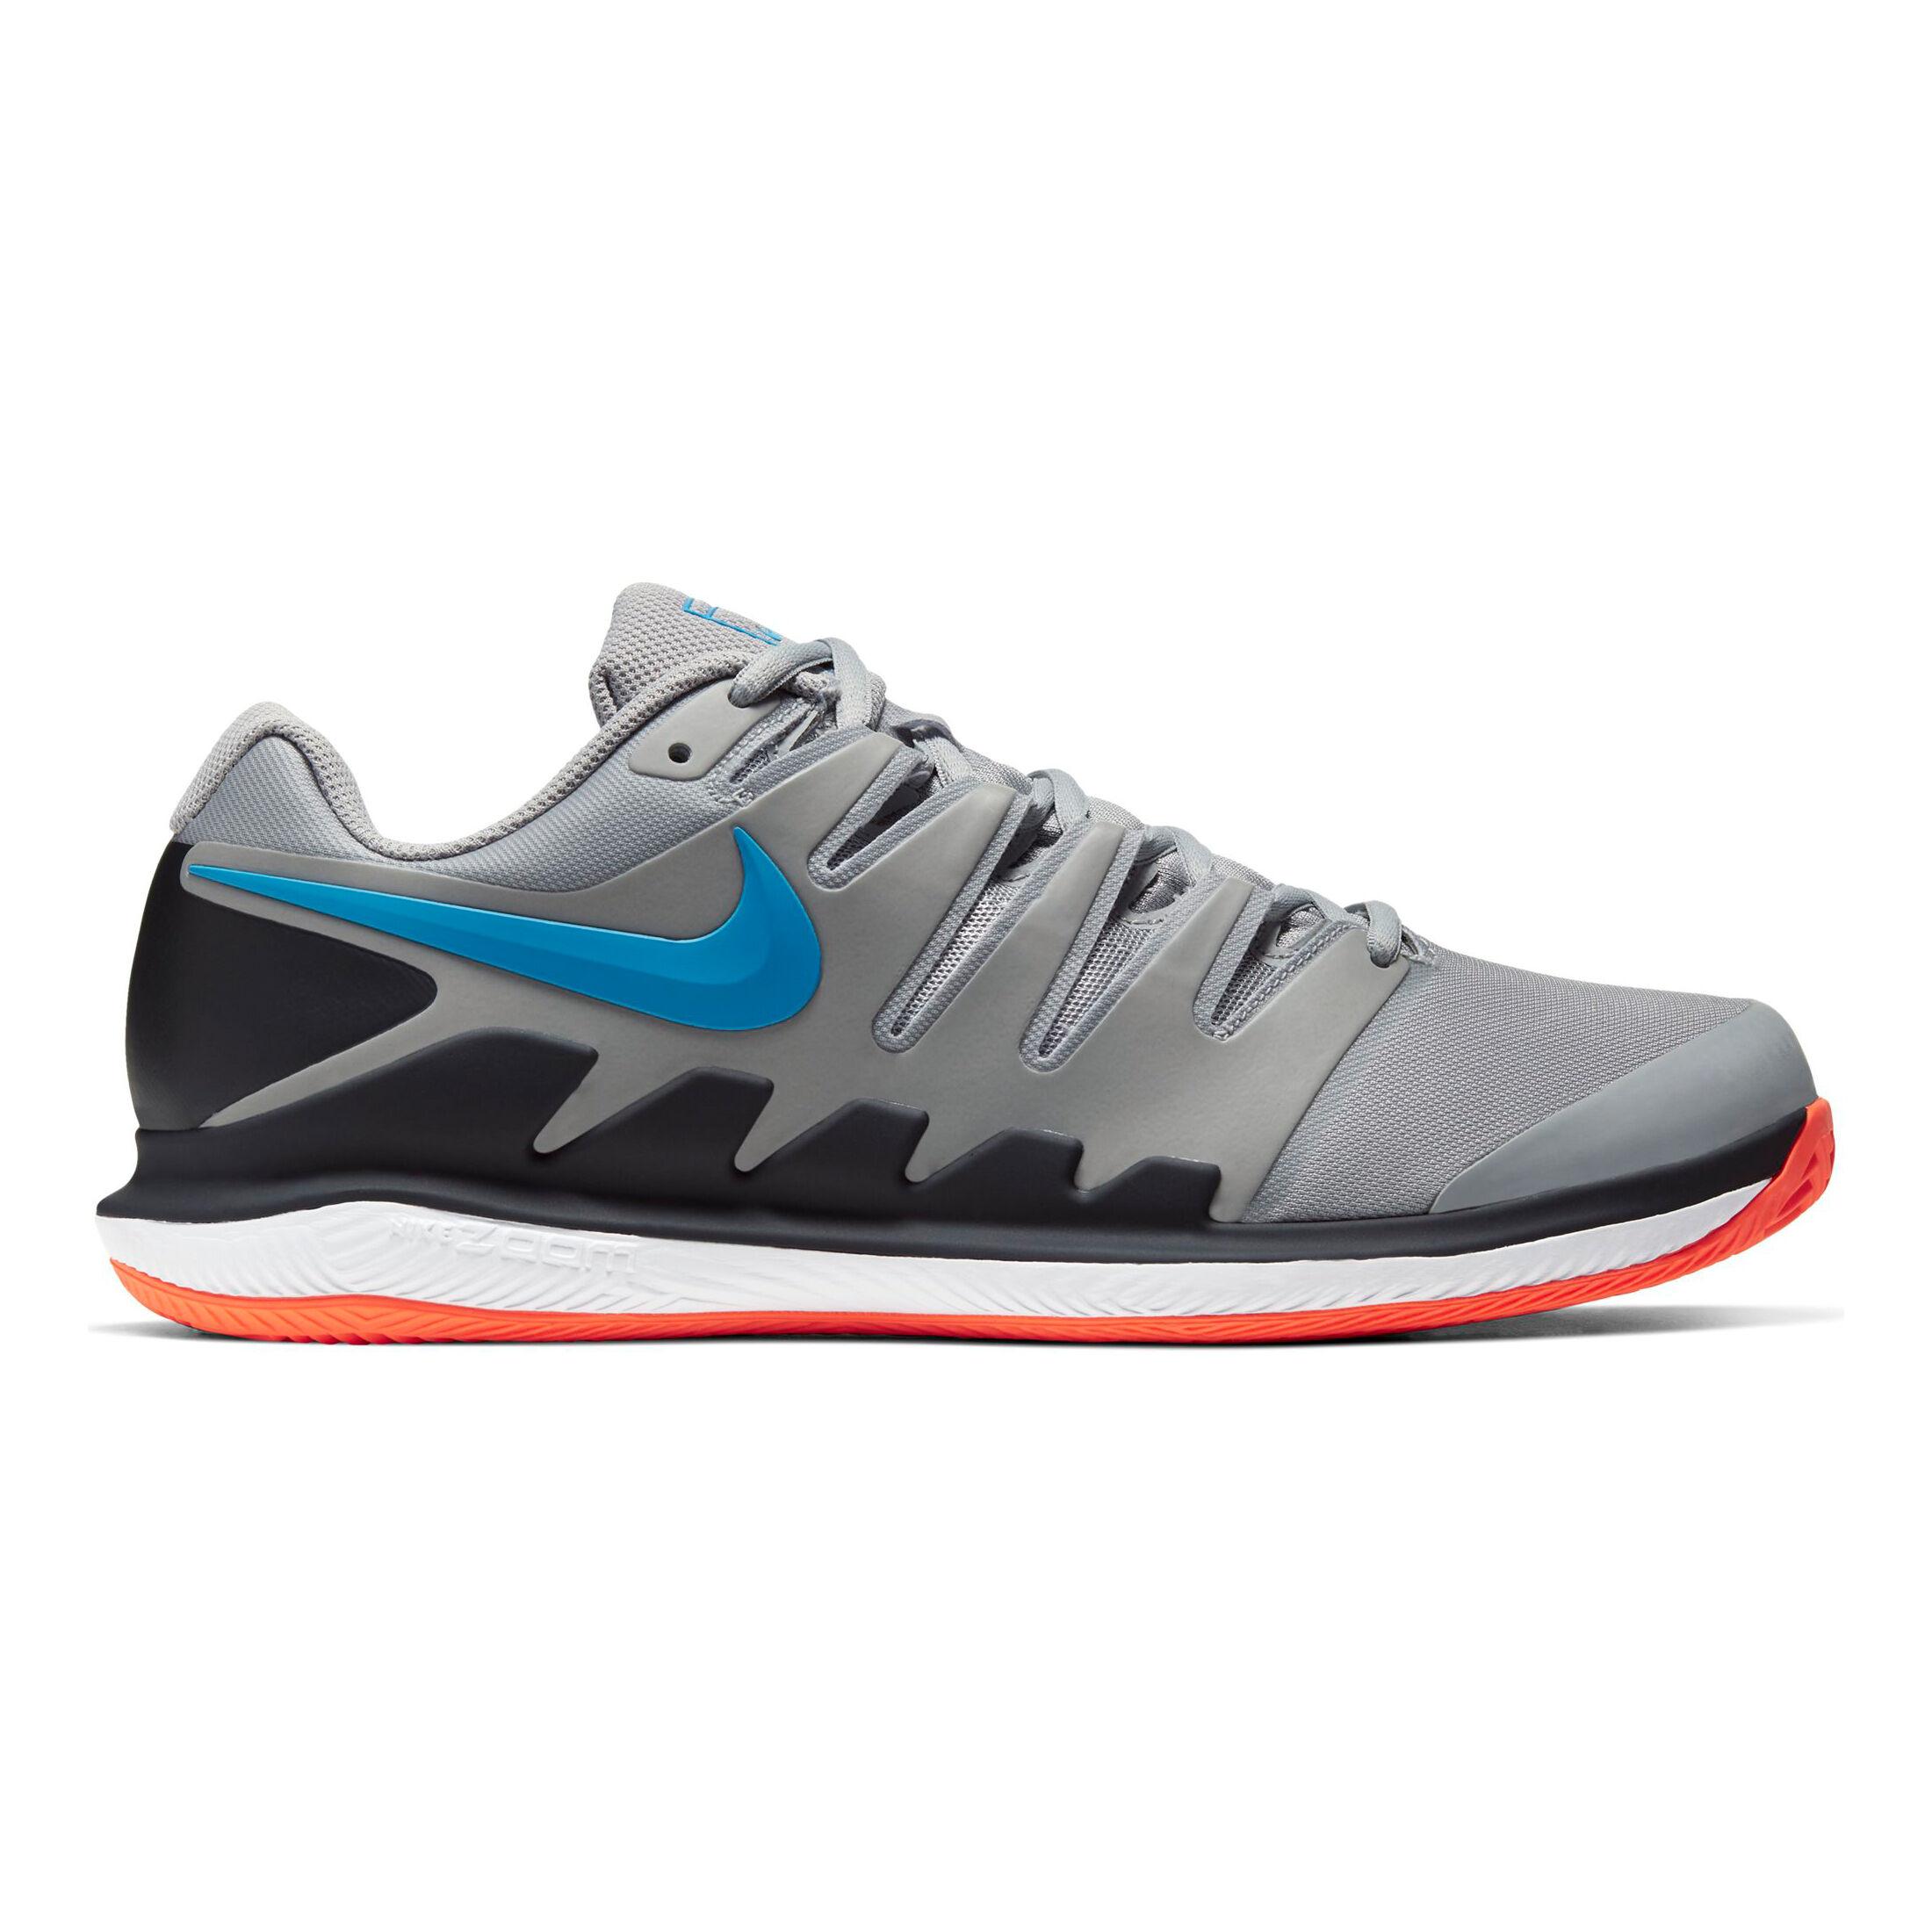 Nike Air Zoom Vapor X Clay Scarpa Per Terra Rossa Uomini